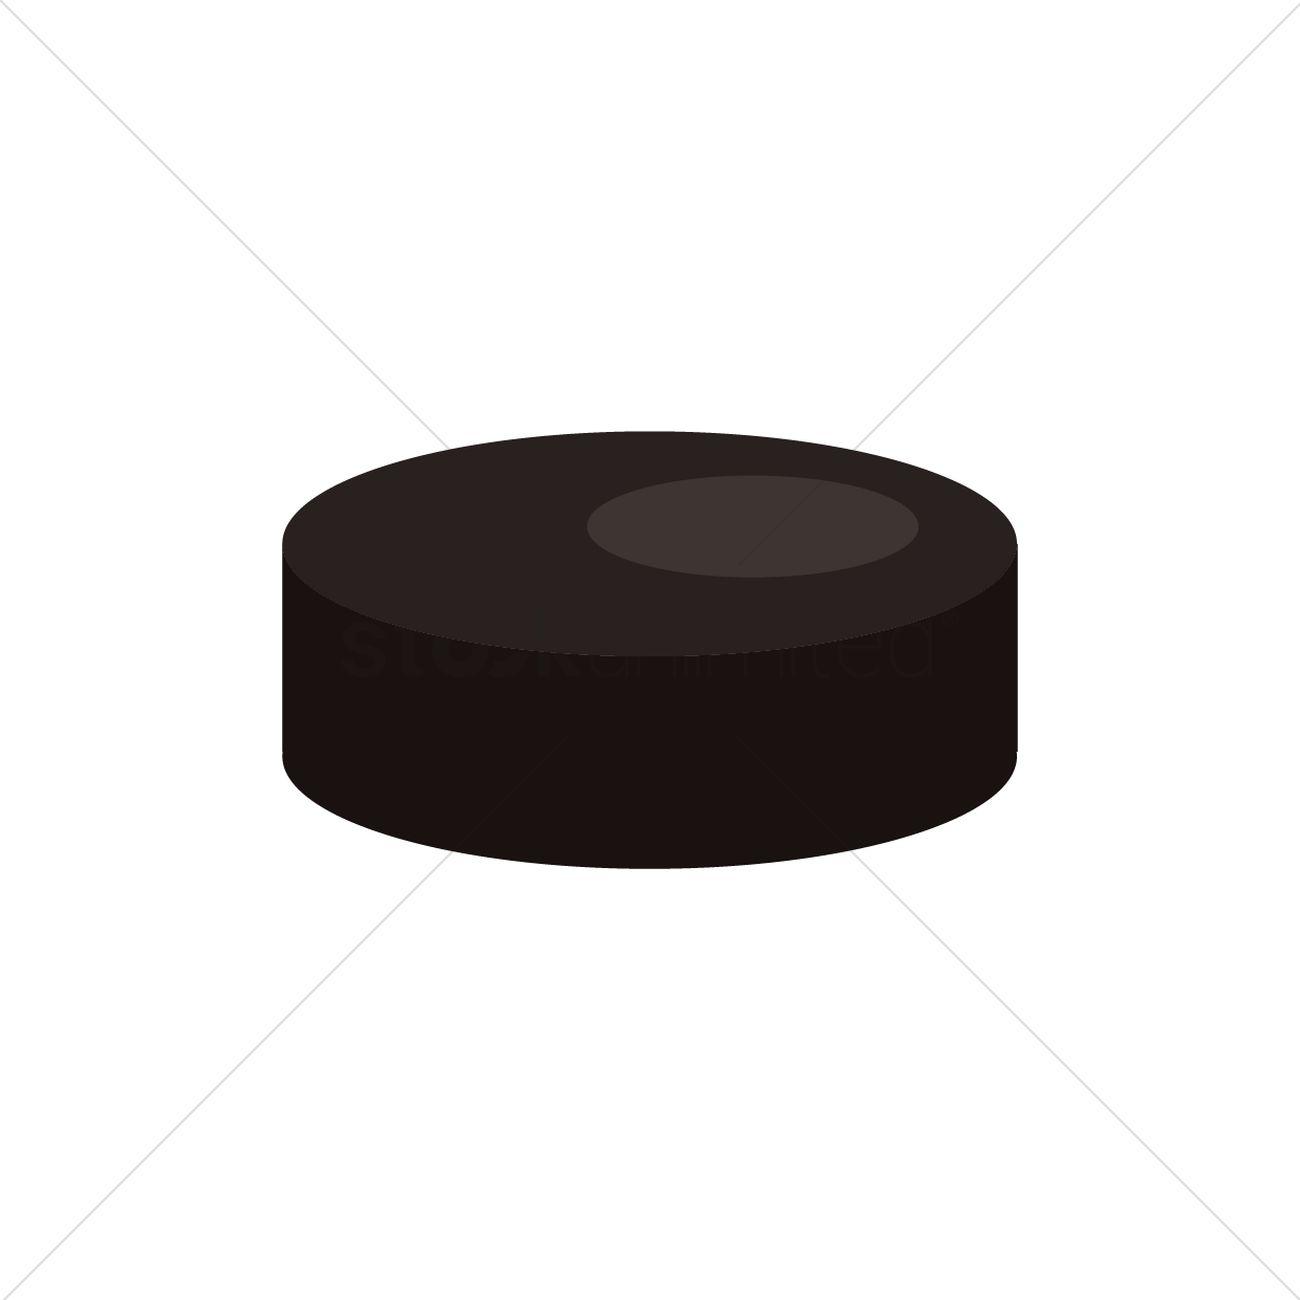 1300x1300 Ice Hockey Puck Vector Image